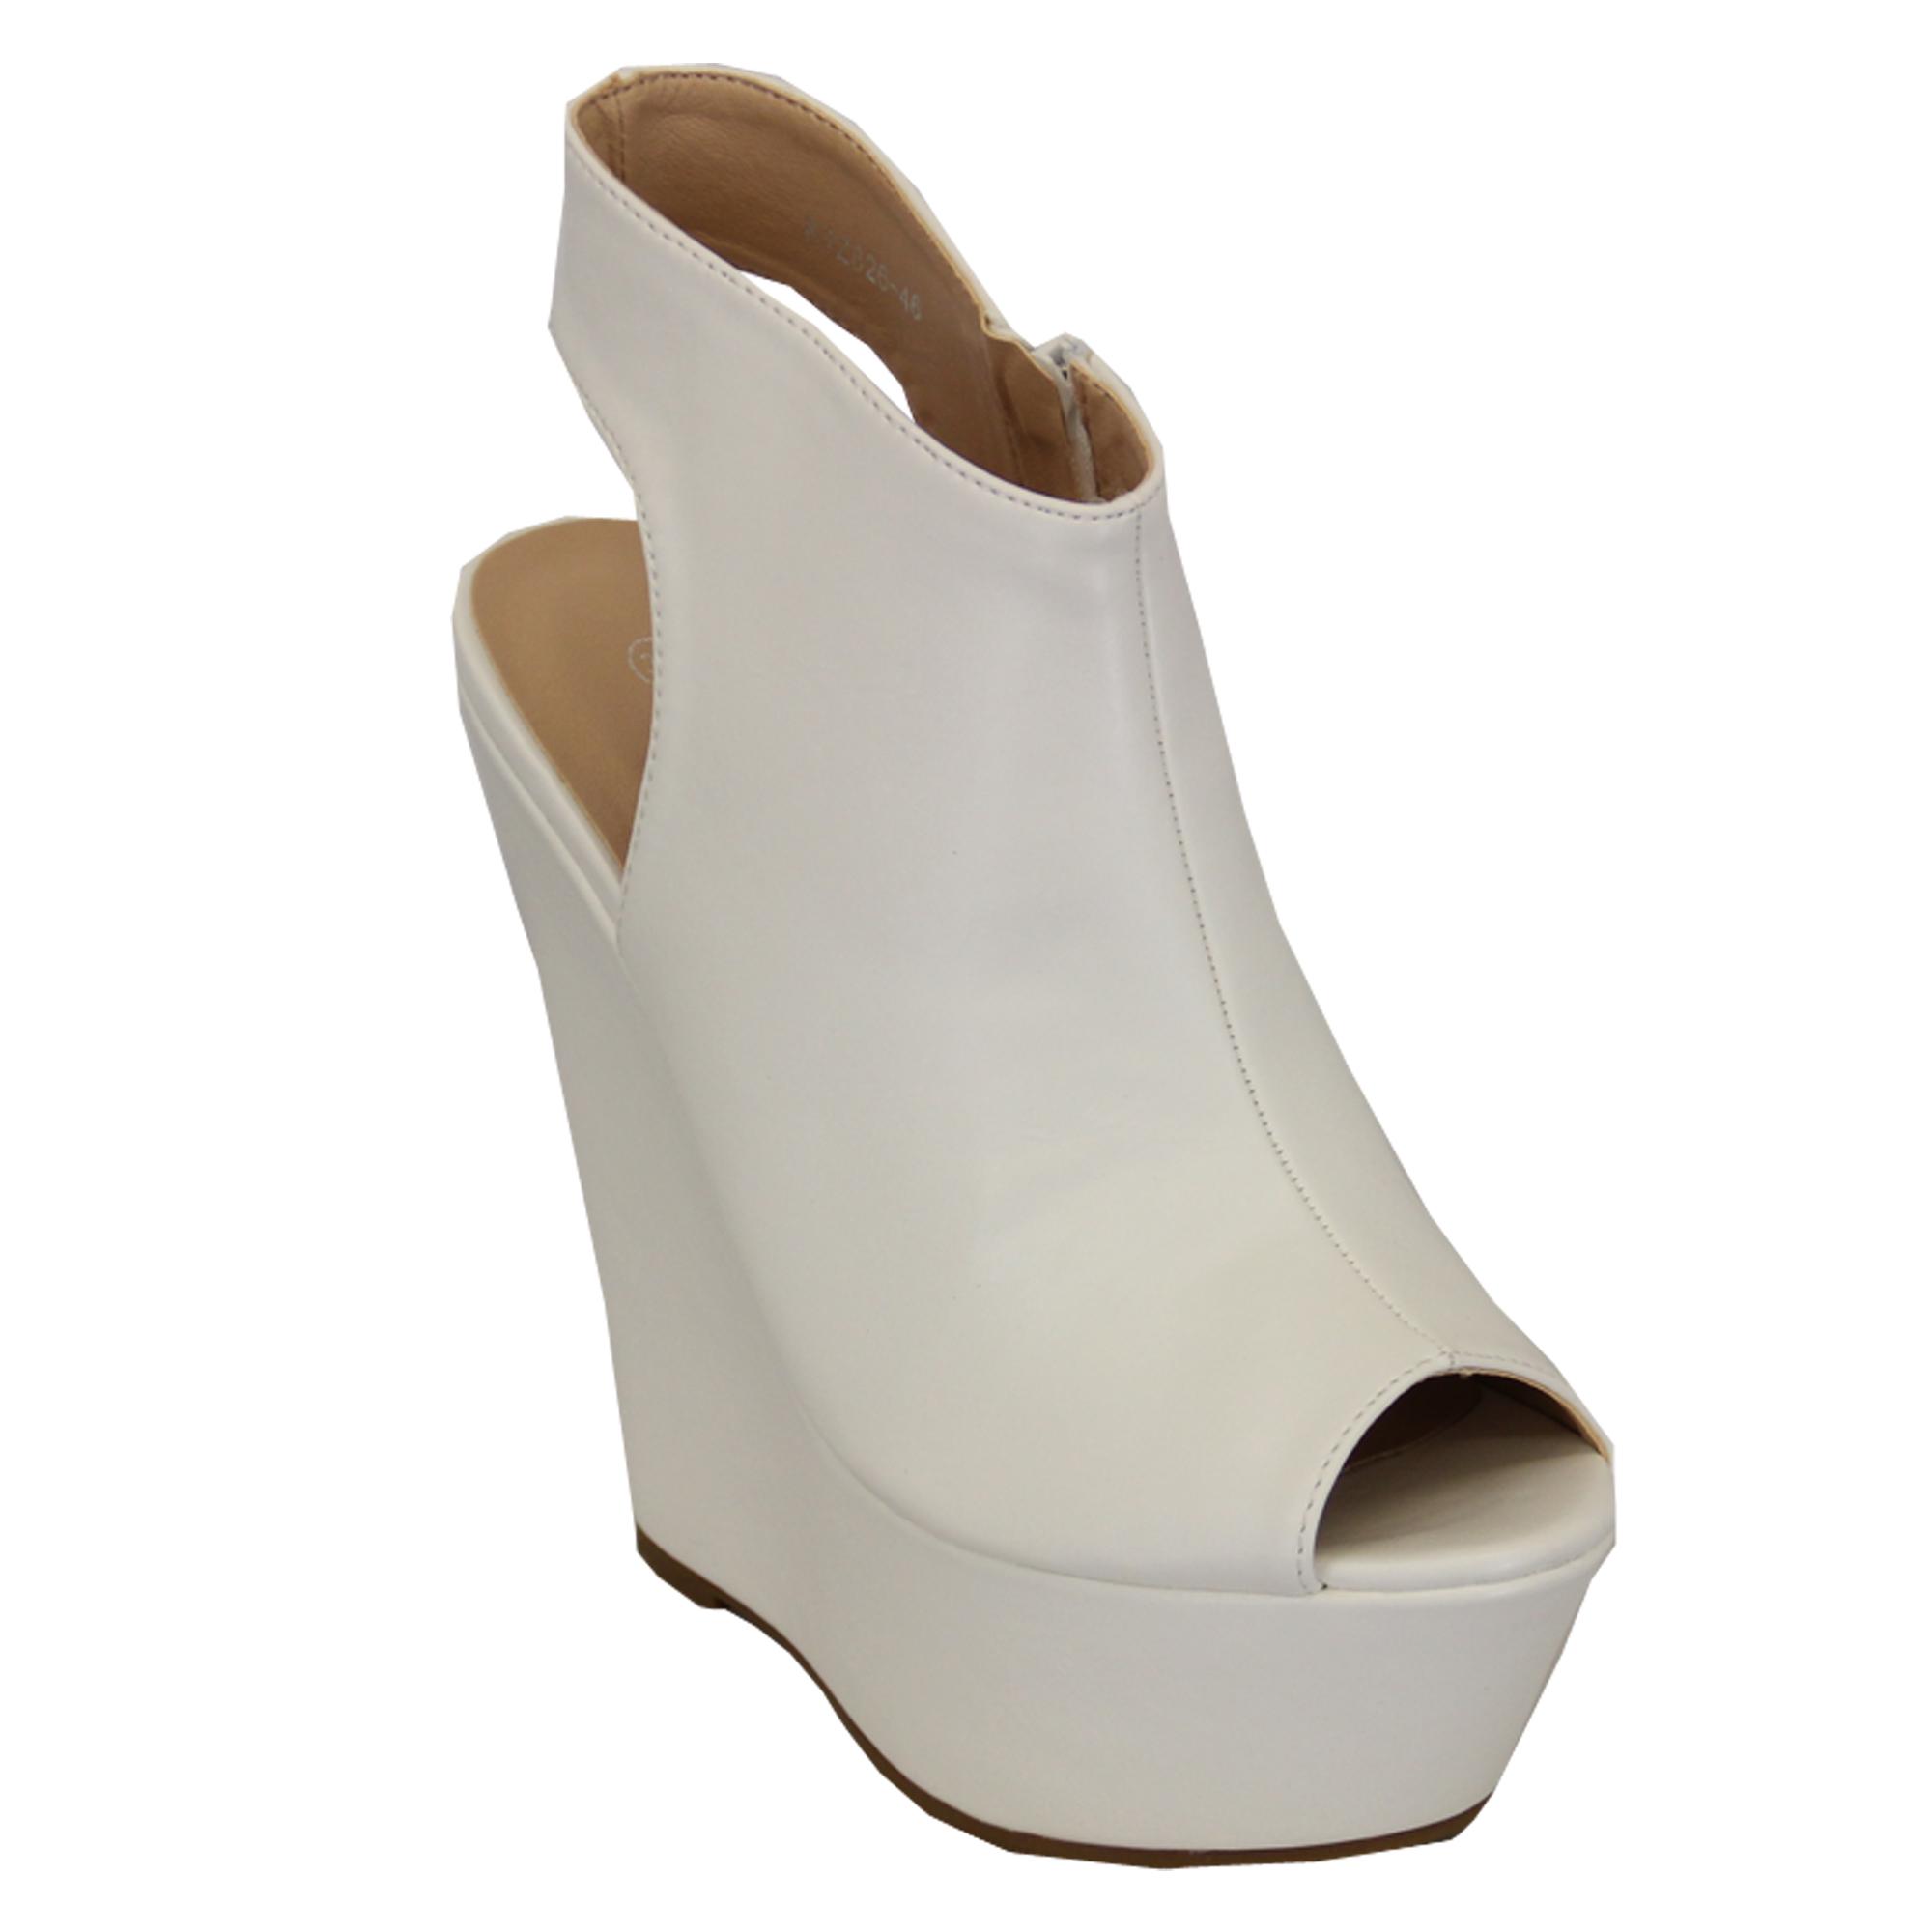 Ladies Wedge Platform Peep Toe Cut Out Sandals Womens High Heel Shoes Summer New